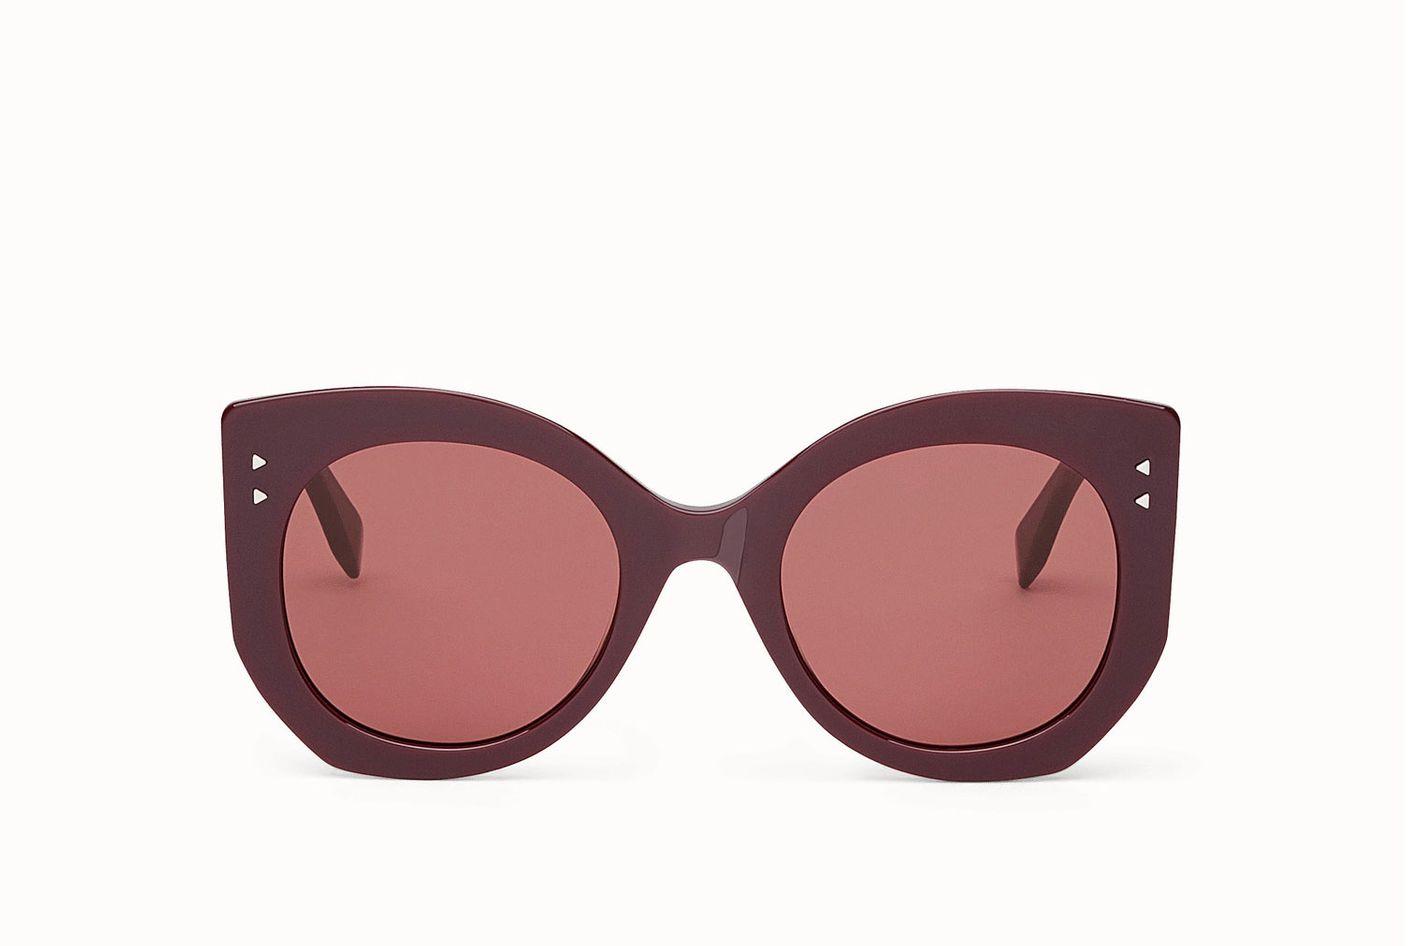 PEEKABOO Burgundy sunglasses